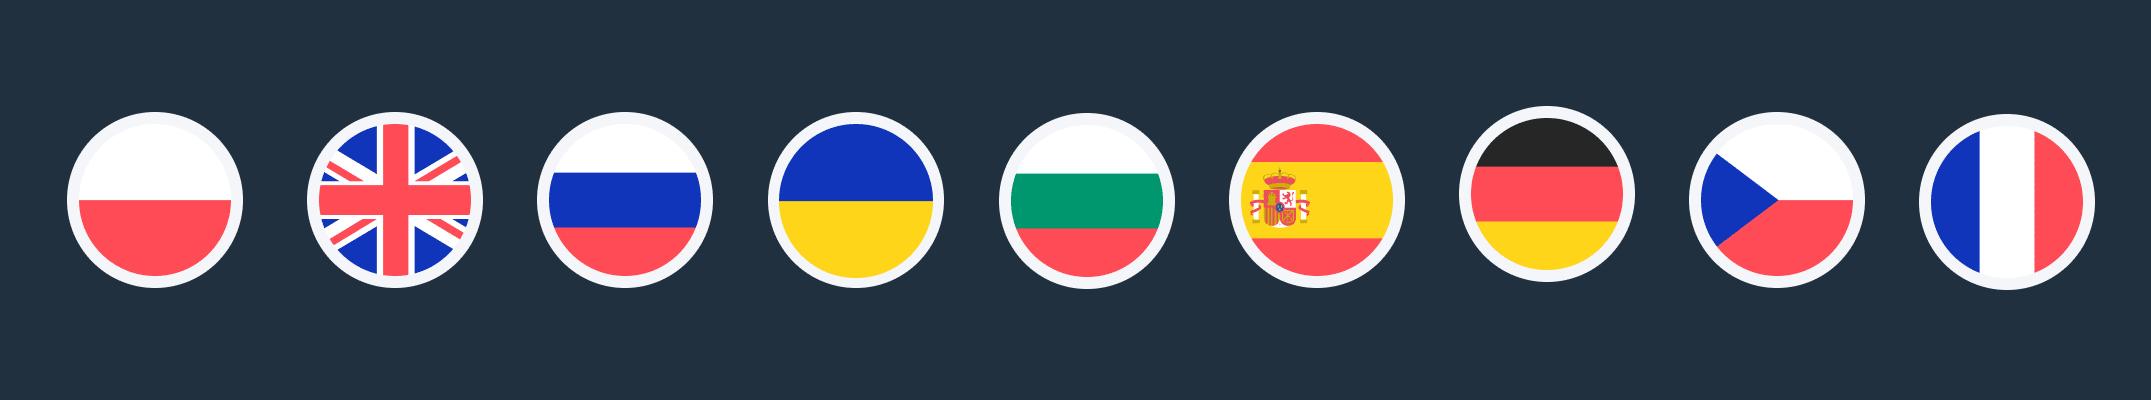 flagi.png